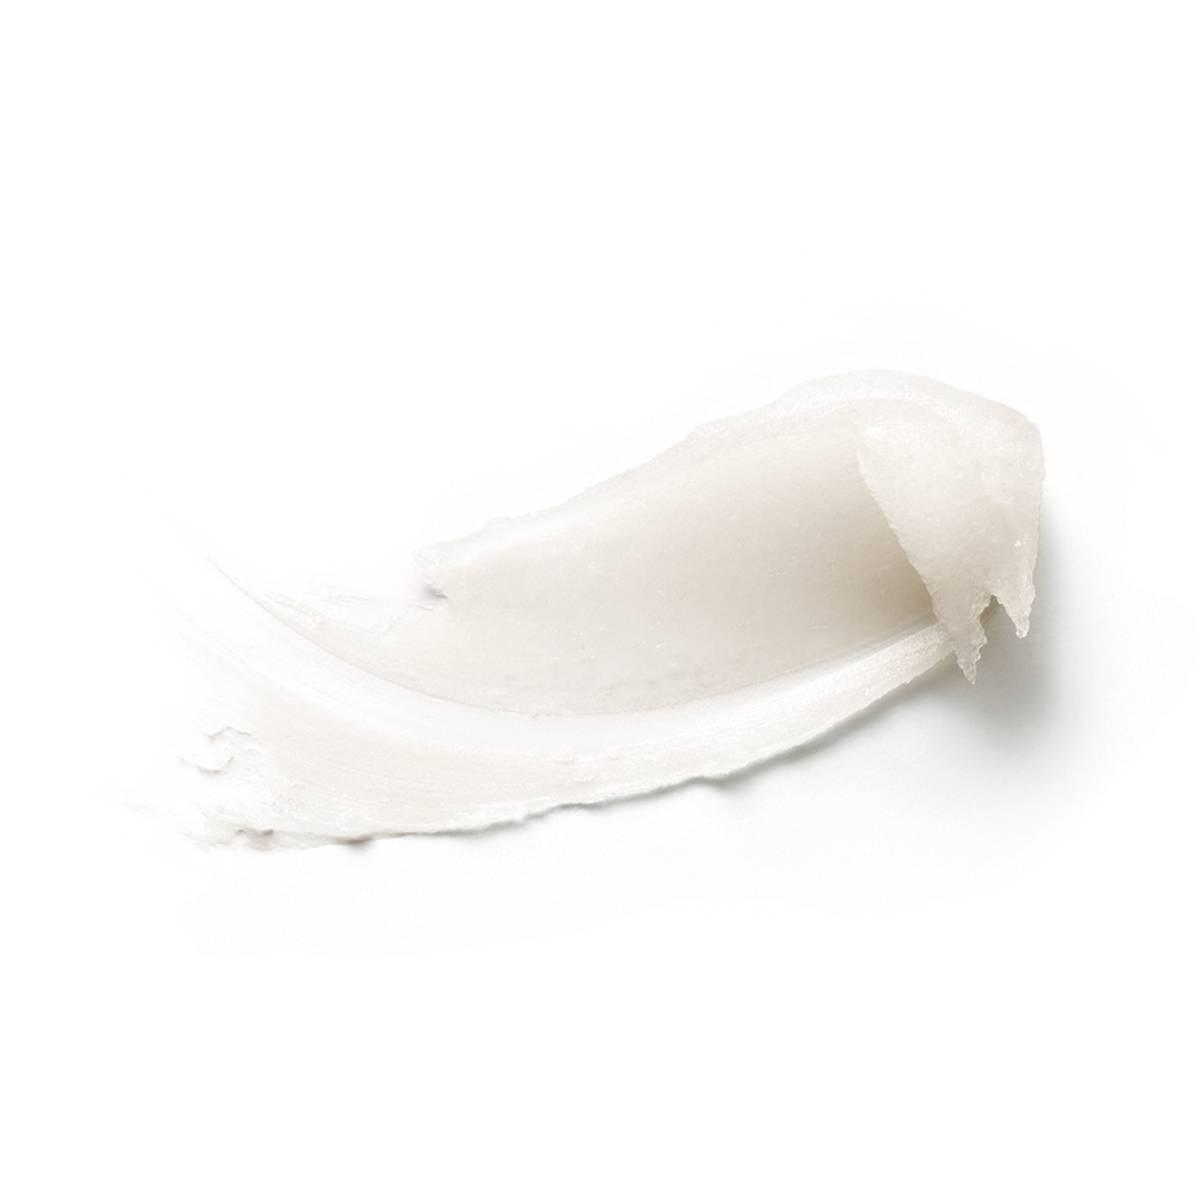 La Roche Posay ProductPage Damaged Cicaplast Lip Balm Texture